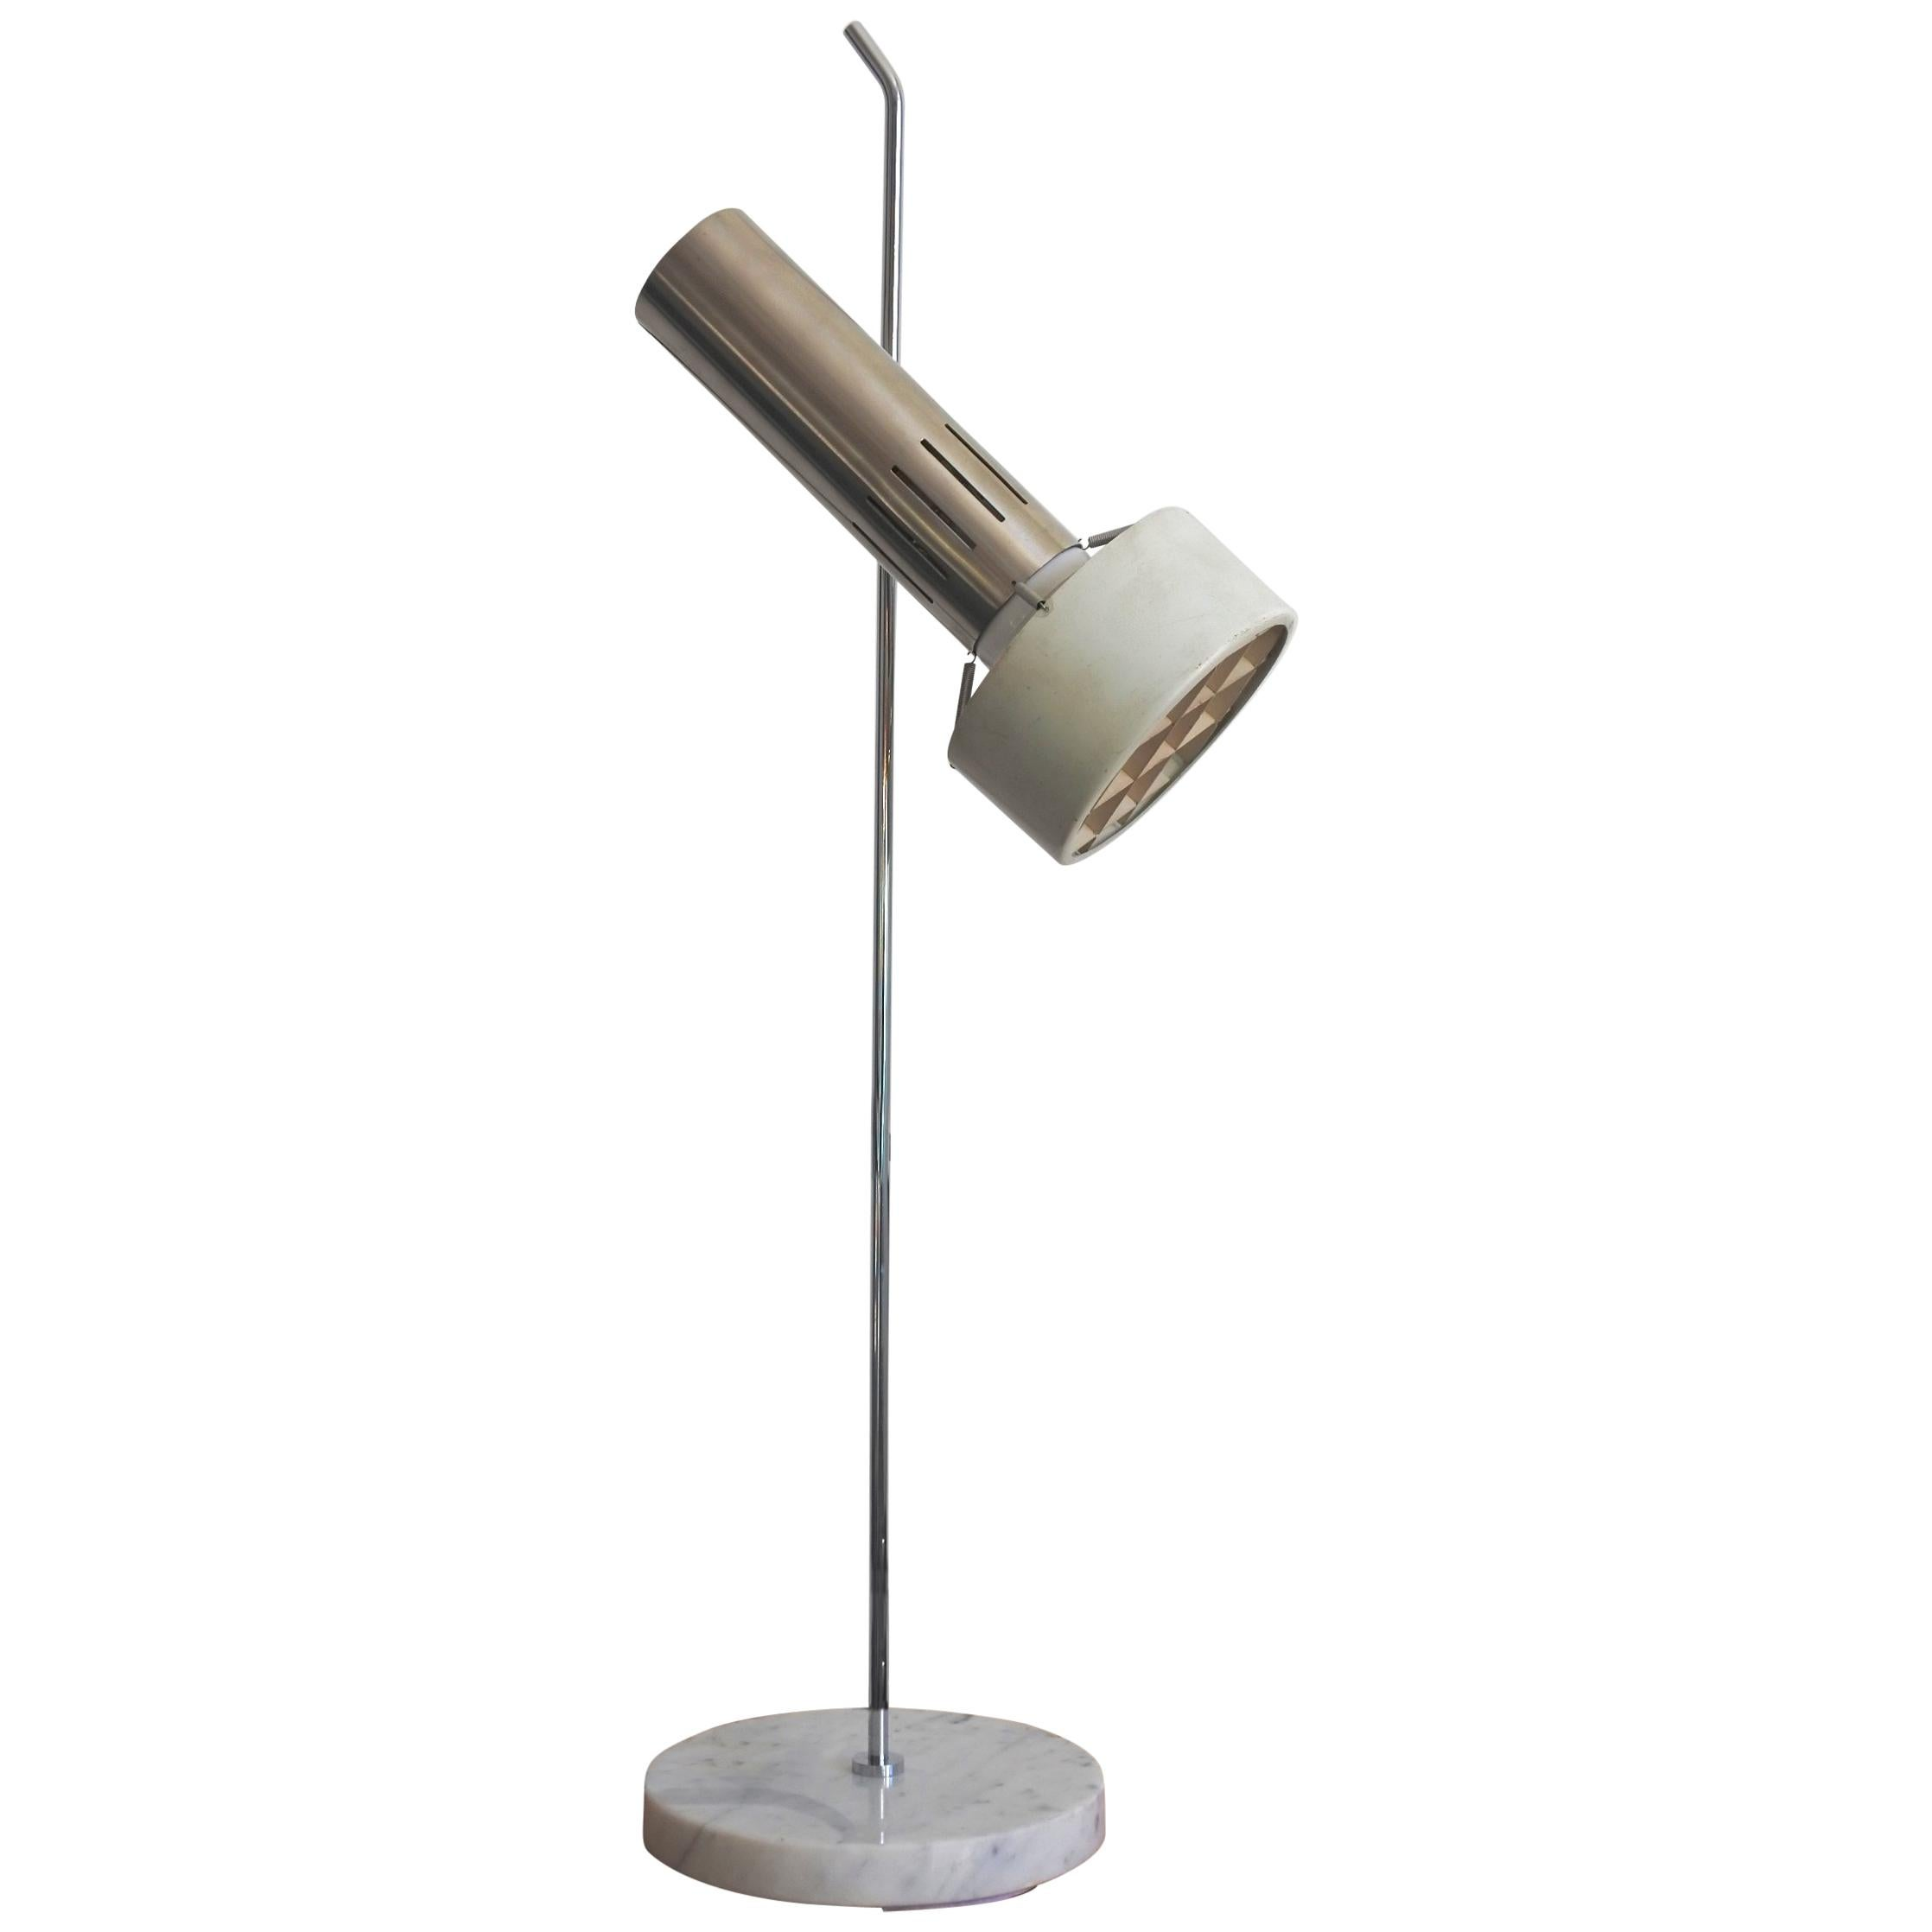 Alain Richard A4 Table Lamp with Marble Base, Ed Disderot, France, 1958